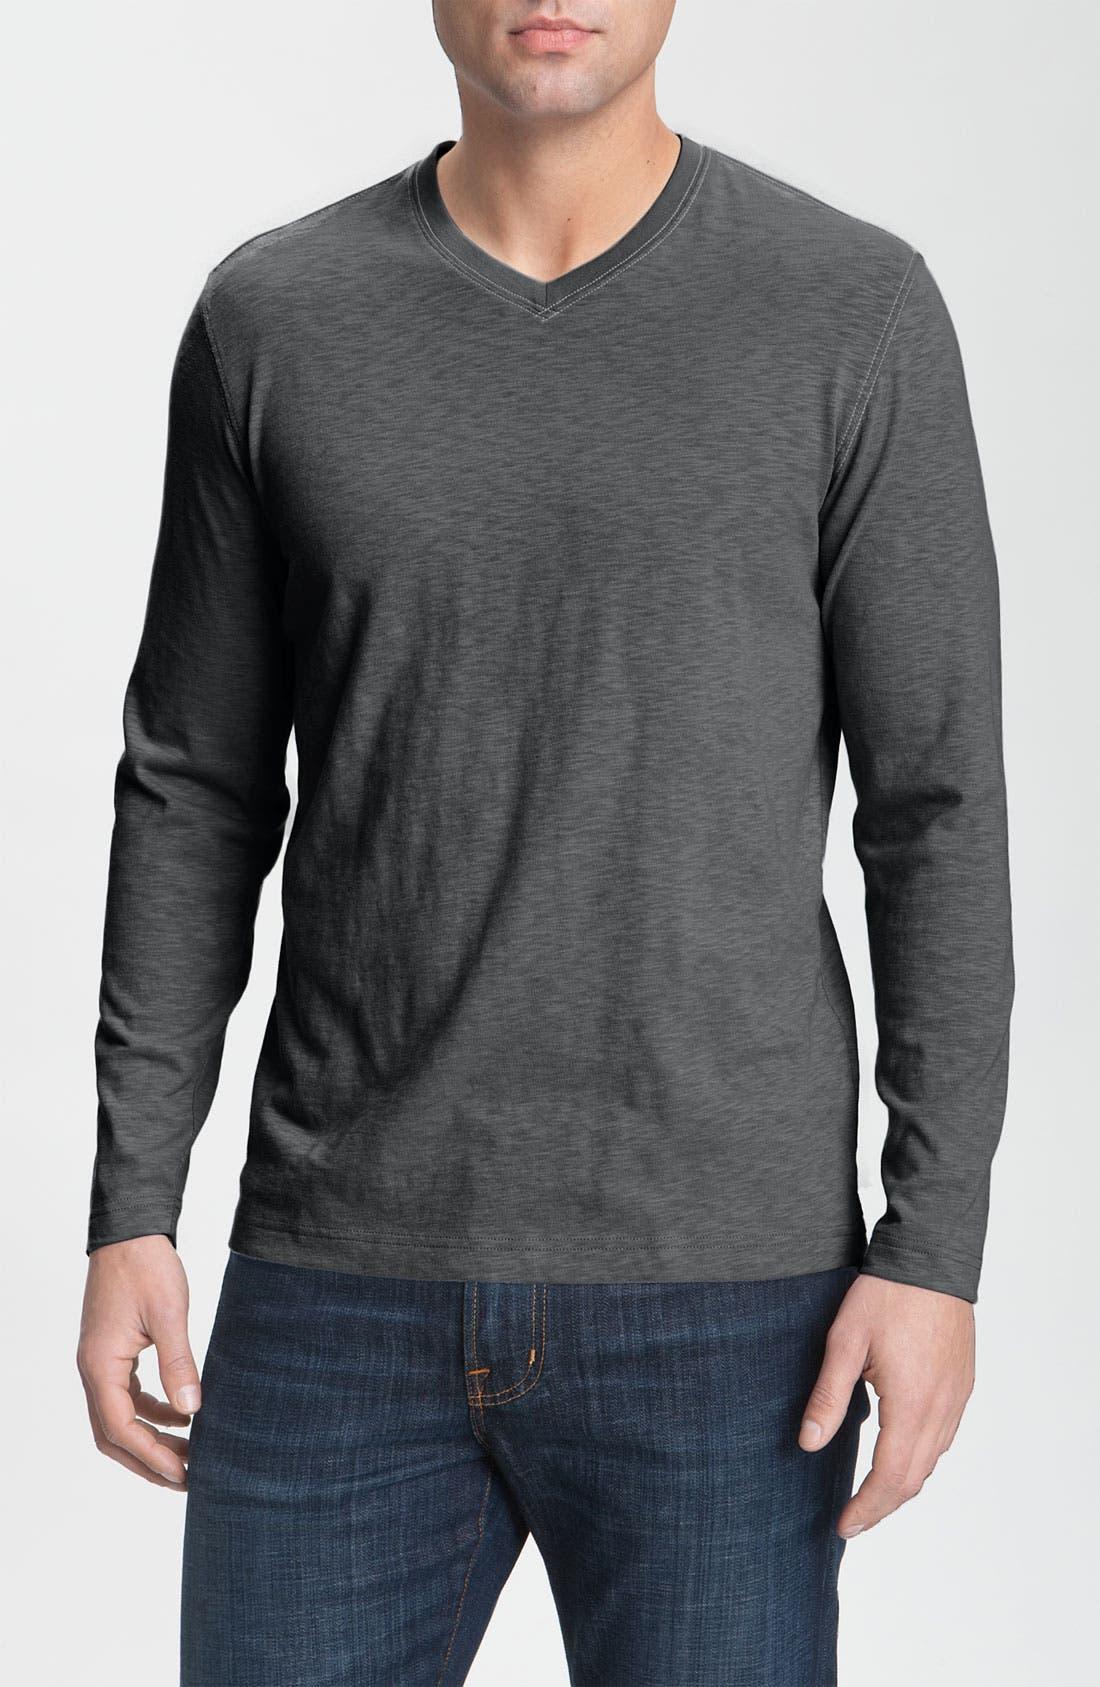 Alternate Image 1 Selected - Robert Barakett 'Miami' Long Sleeve T-Shirt